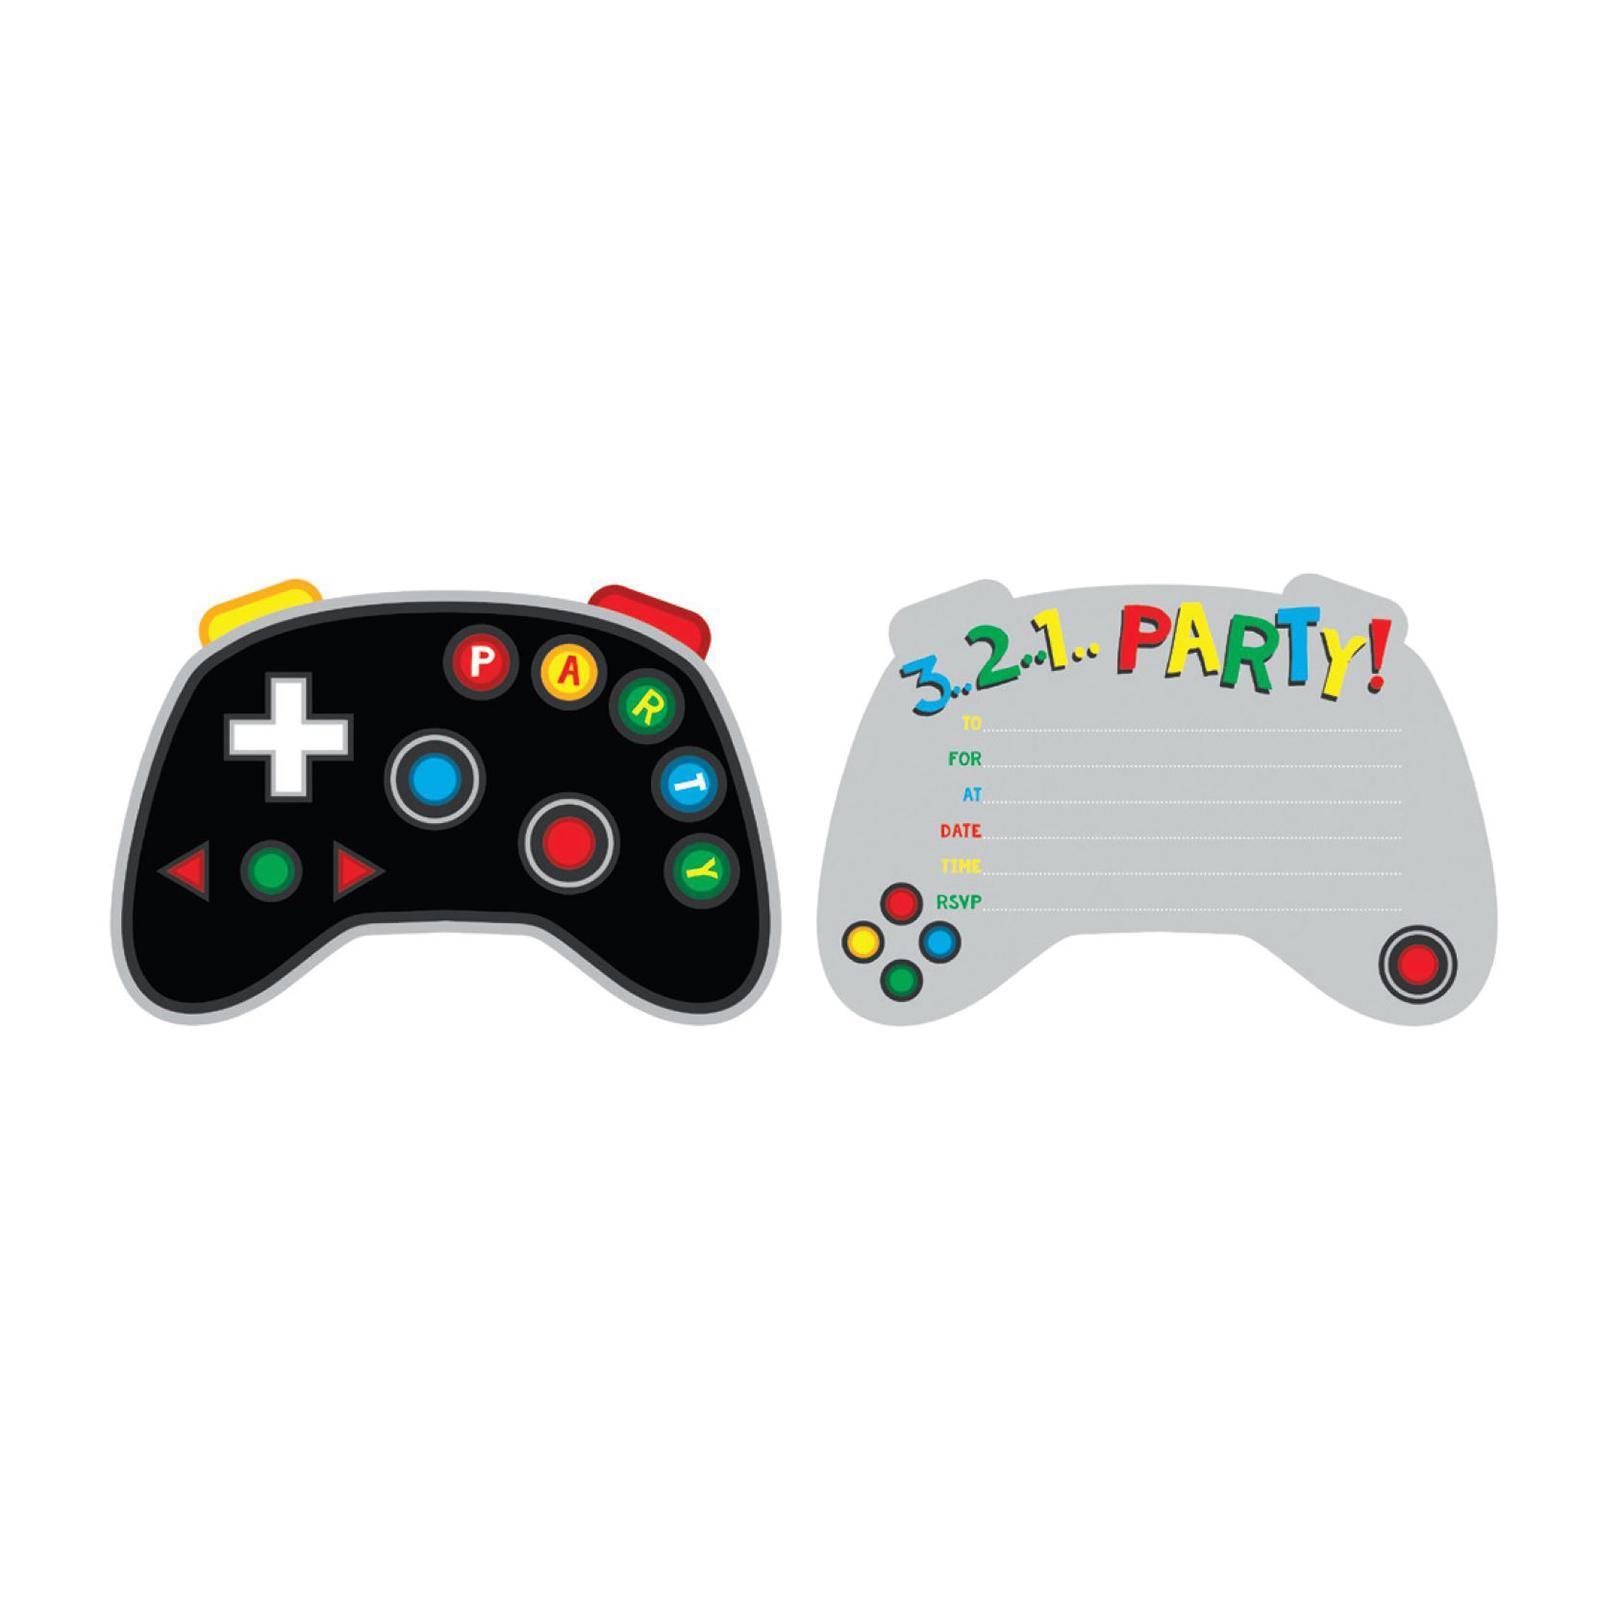 Artwrap Party Invitation - Gaming